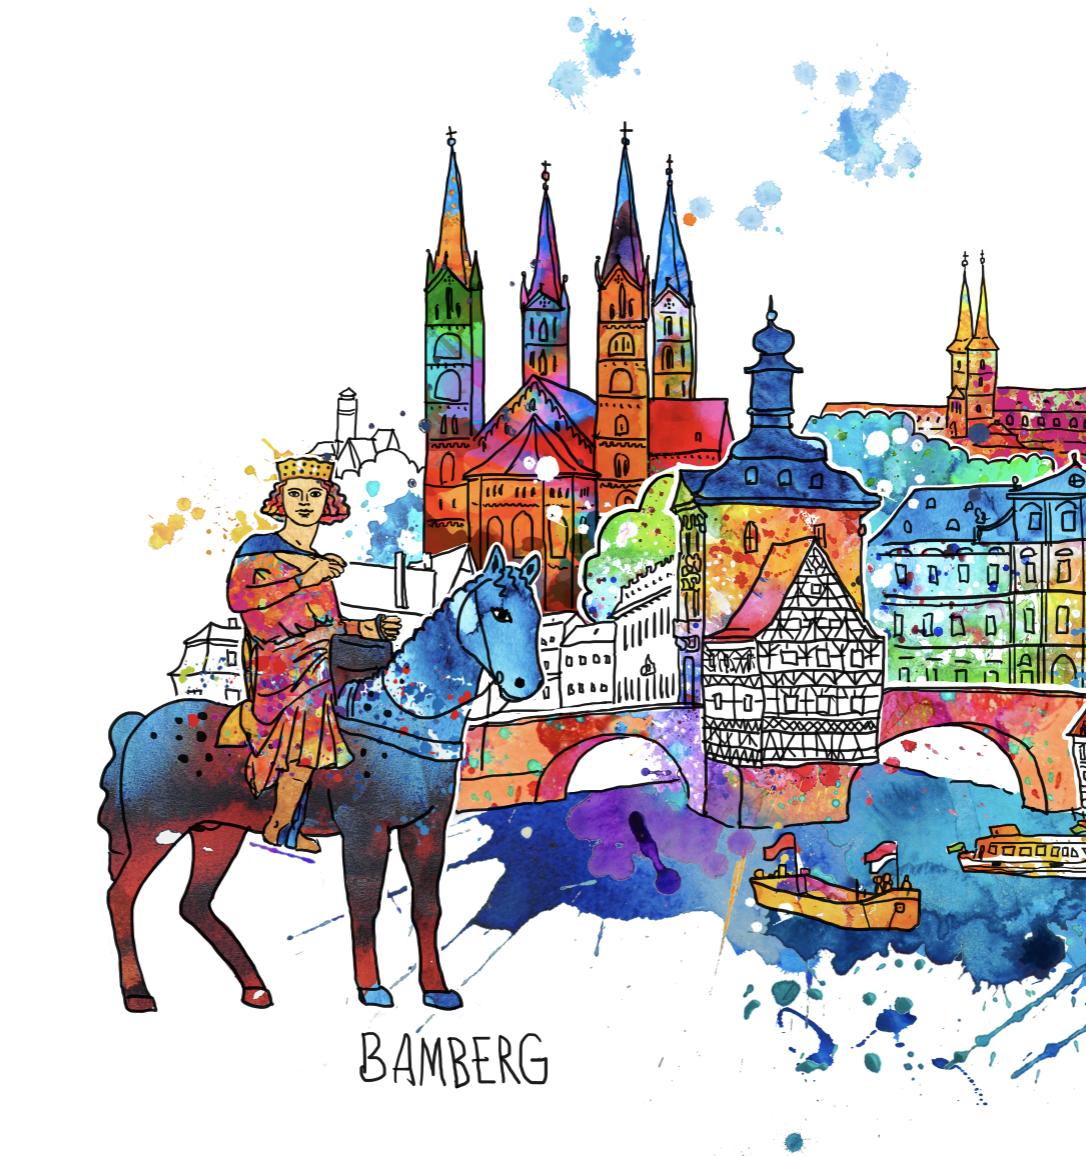 birgit_osten_bamberger_reiter_kunst_metropolregion